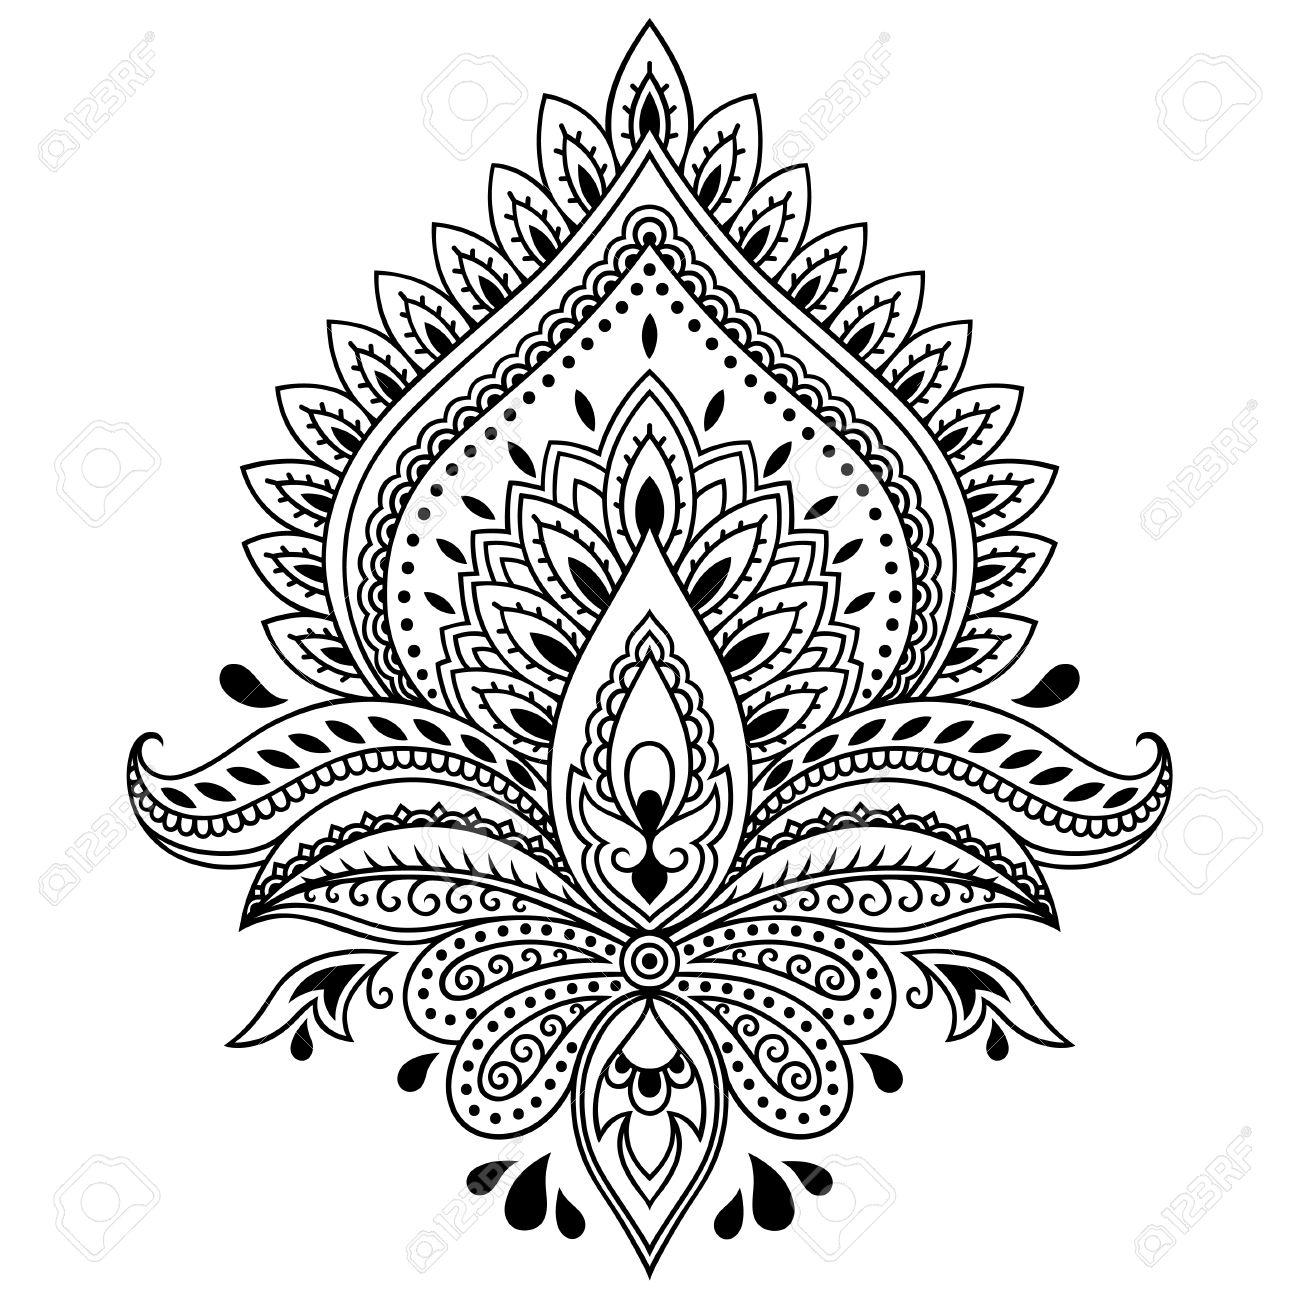 Tatuajes Indios. Top Tatuando Un Indio Piel Roja With Tatuajes ...